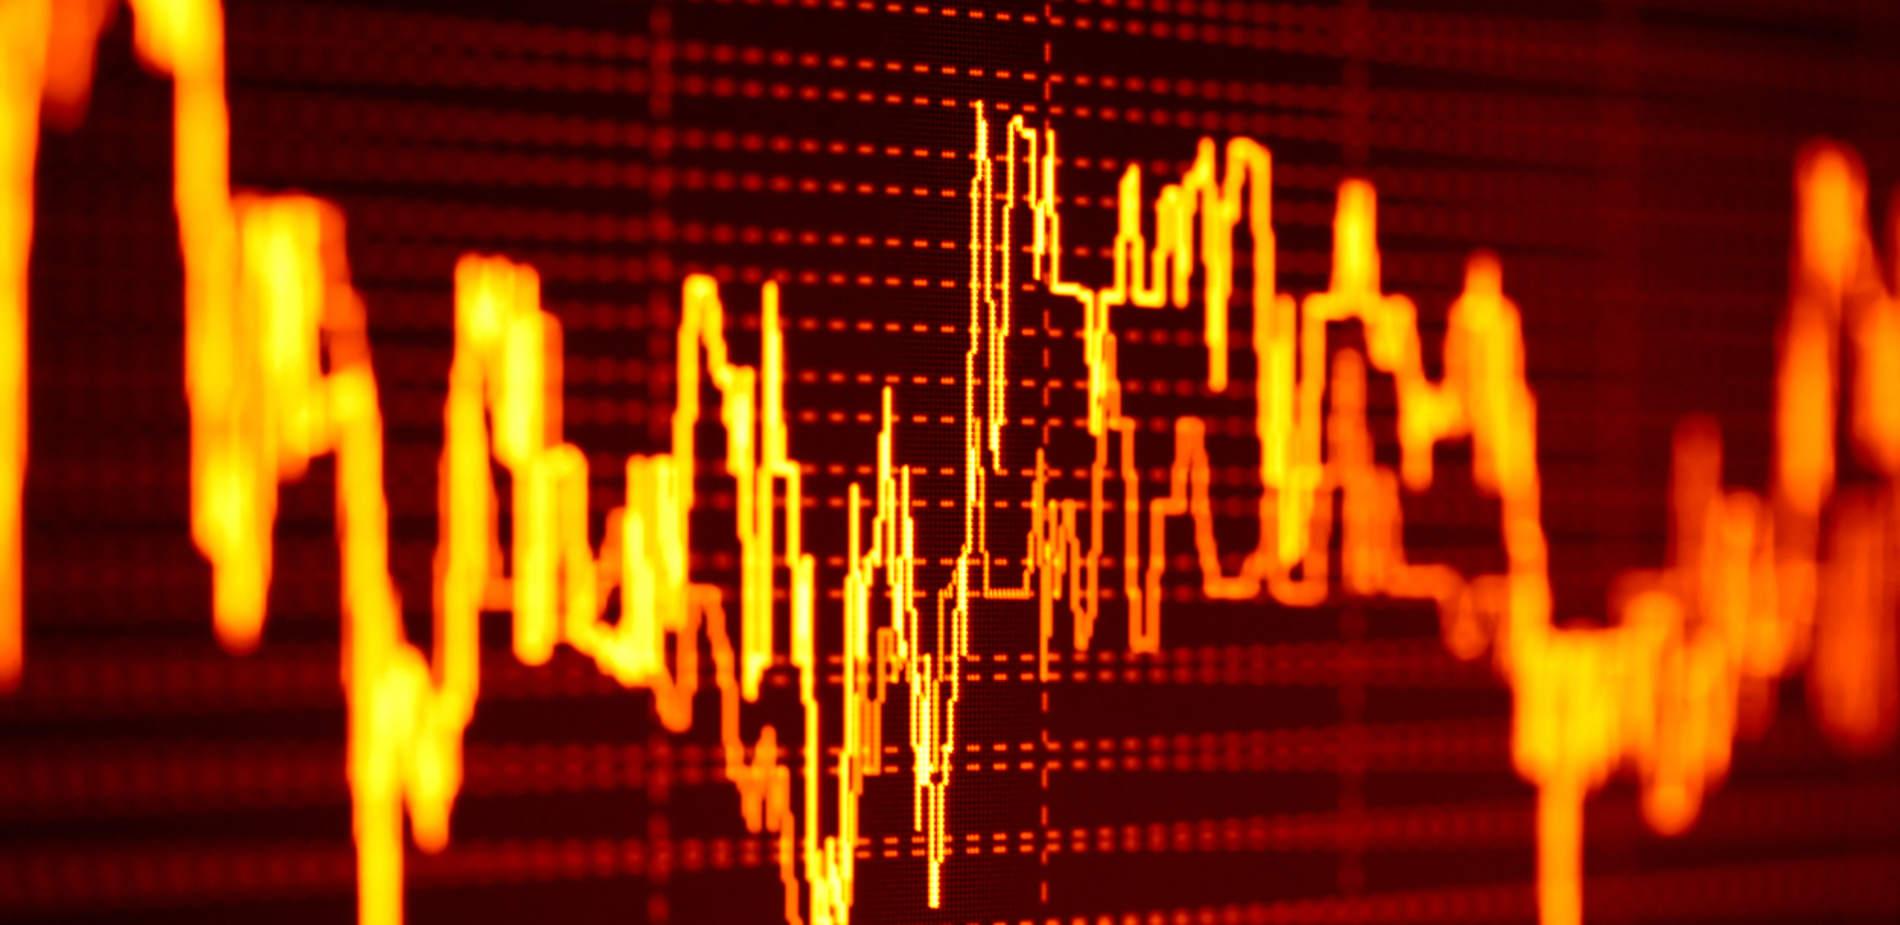 Stock Market Crash Alert Alarming Stock Market Predictions